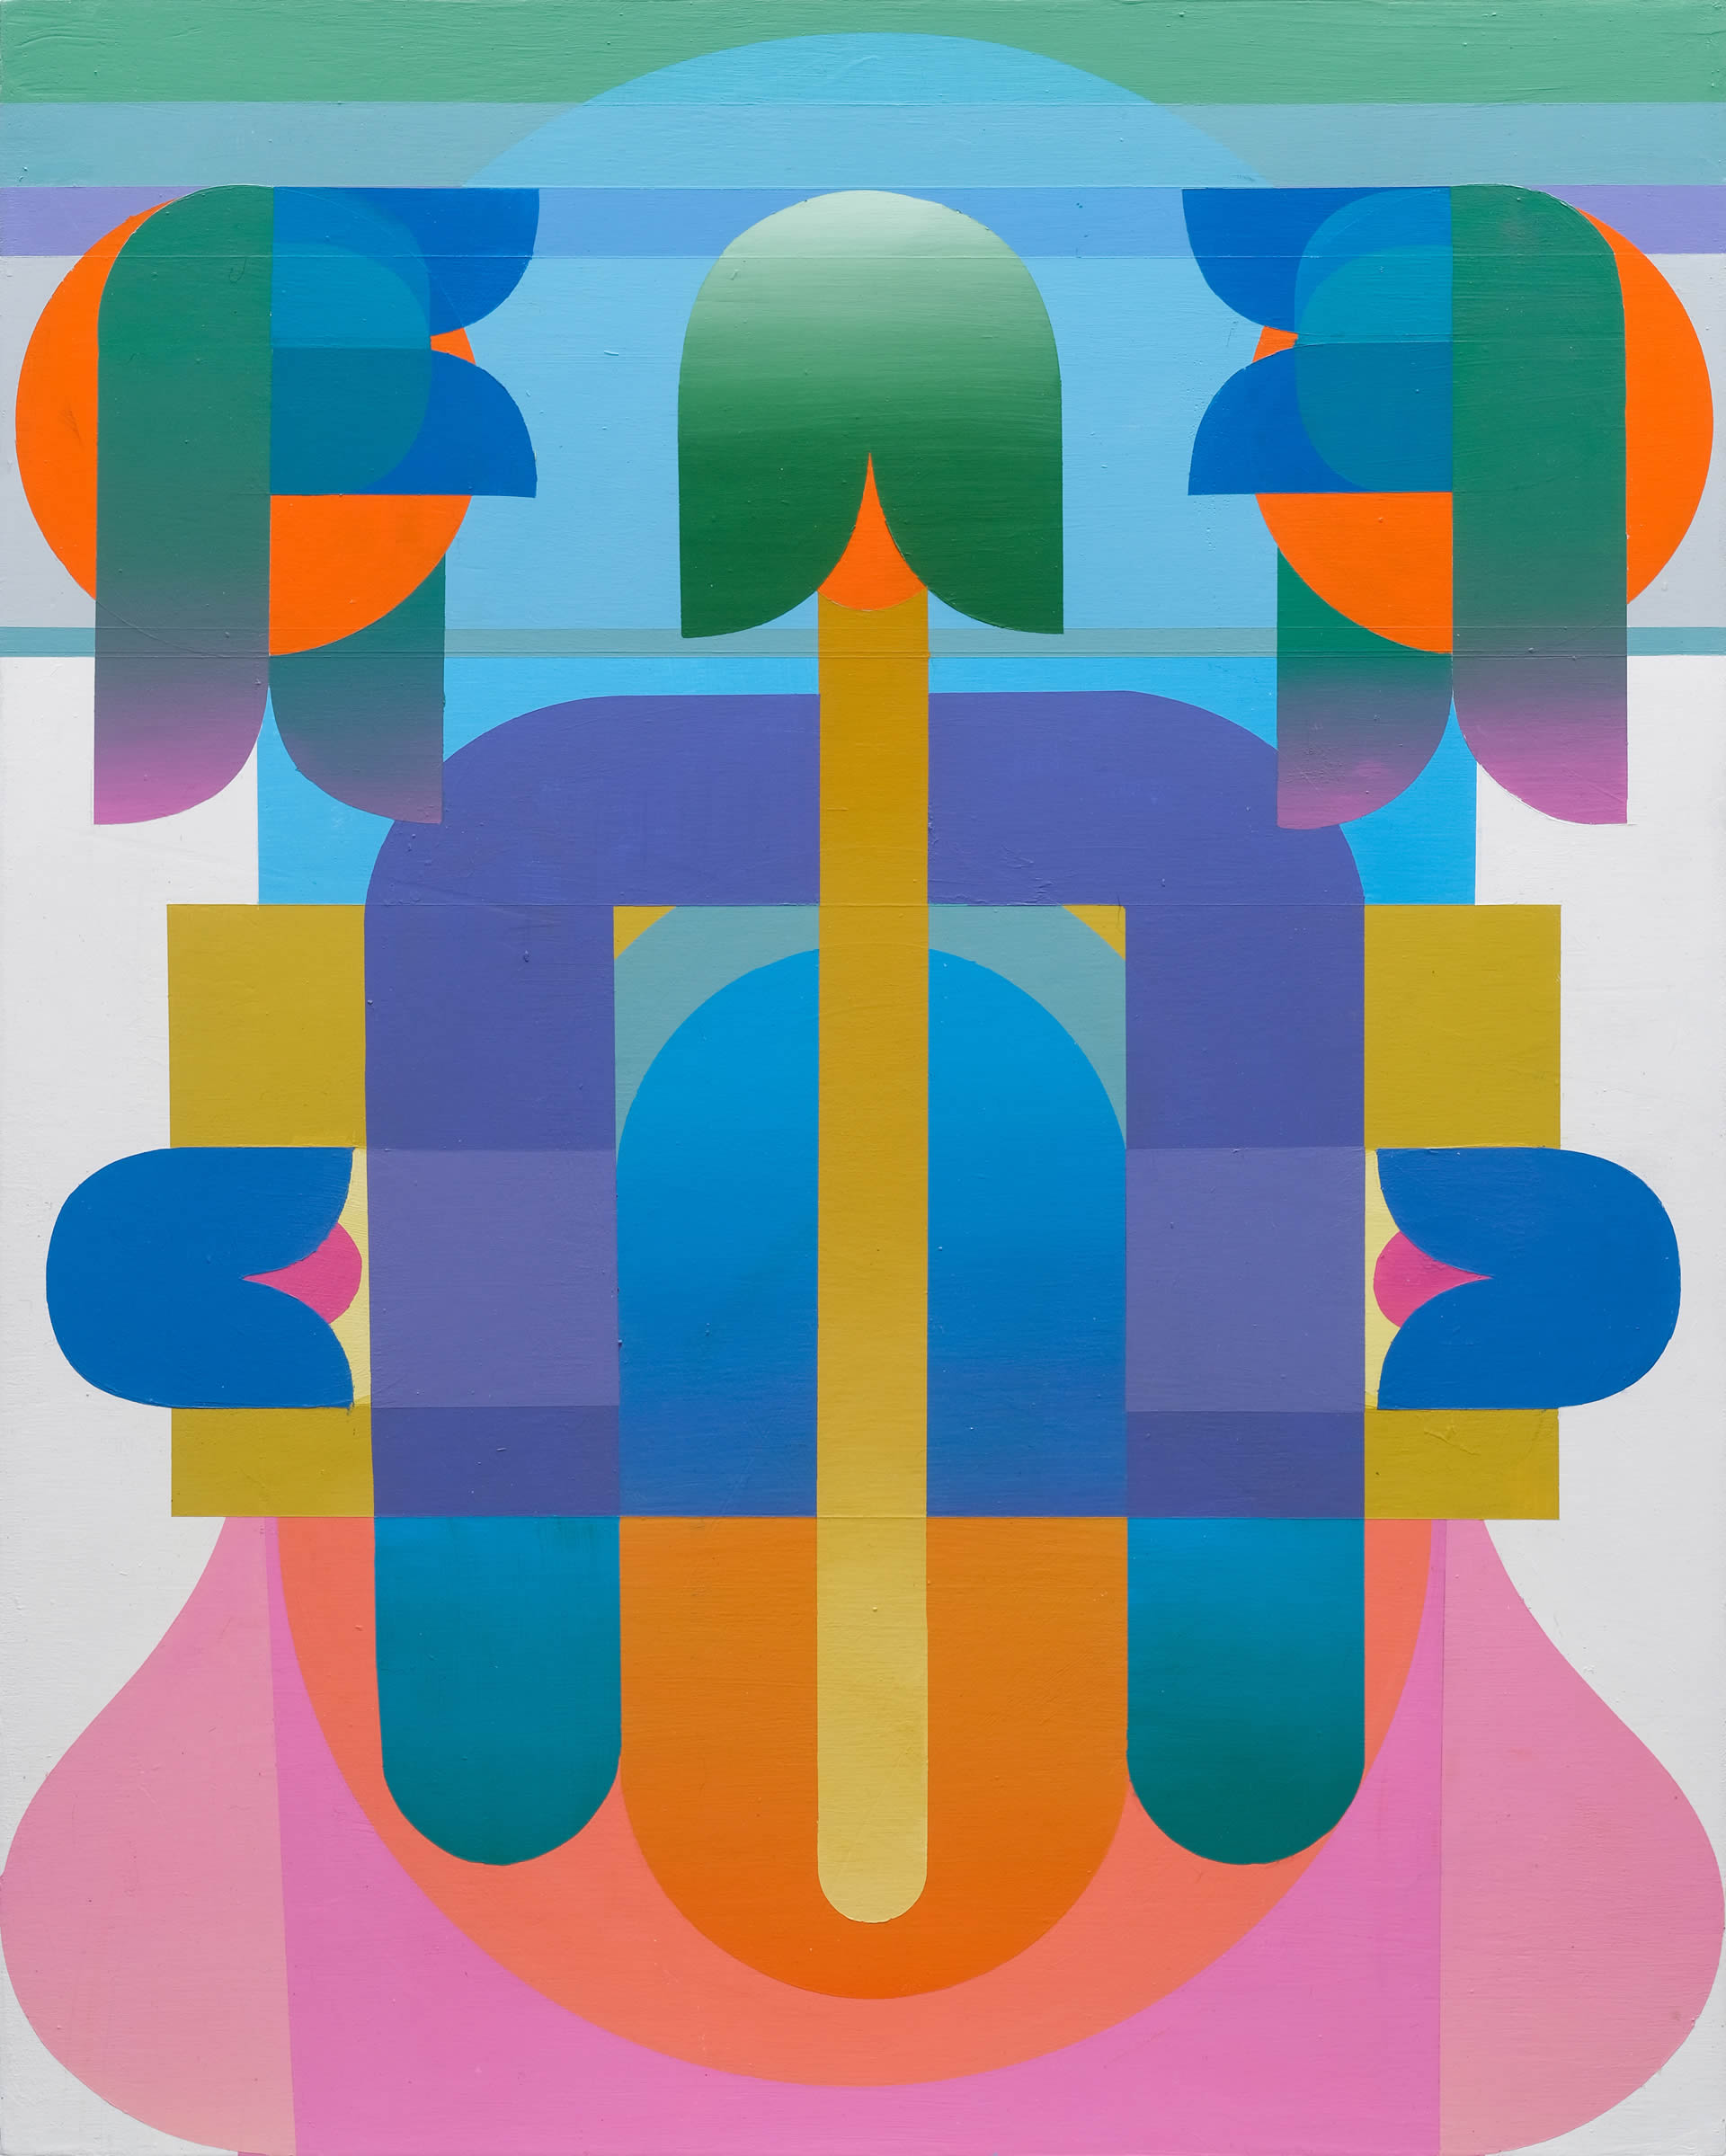 Sarah-Gee-Miller-Optima-2-30x24-Online-Art-Galleries